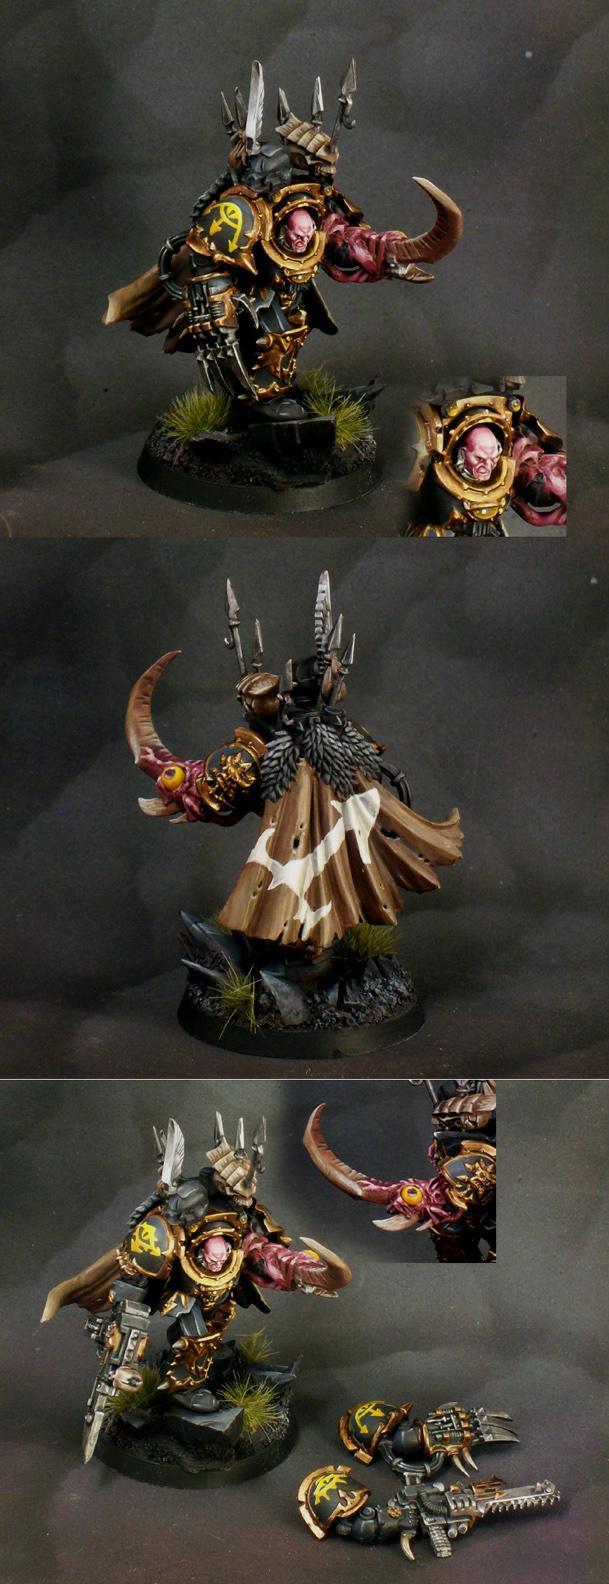 Black Legion, Chaos Lord, Chaos Space Marines, Warhammer 40,000